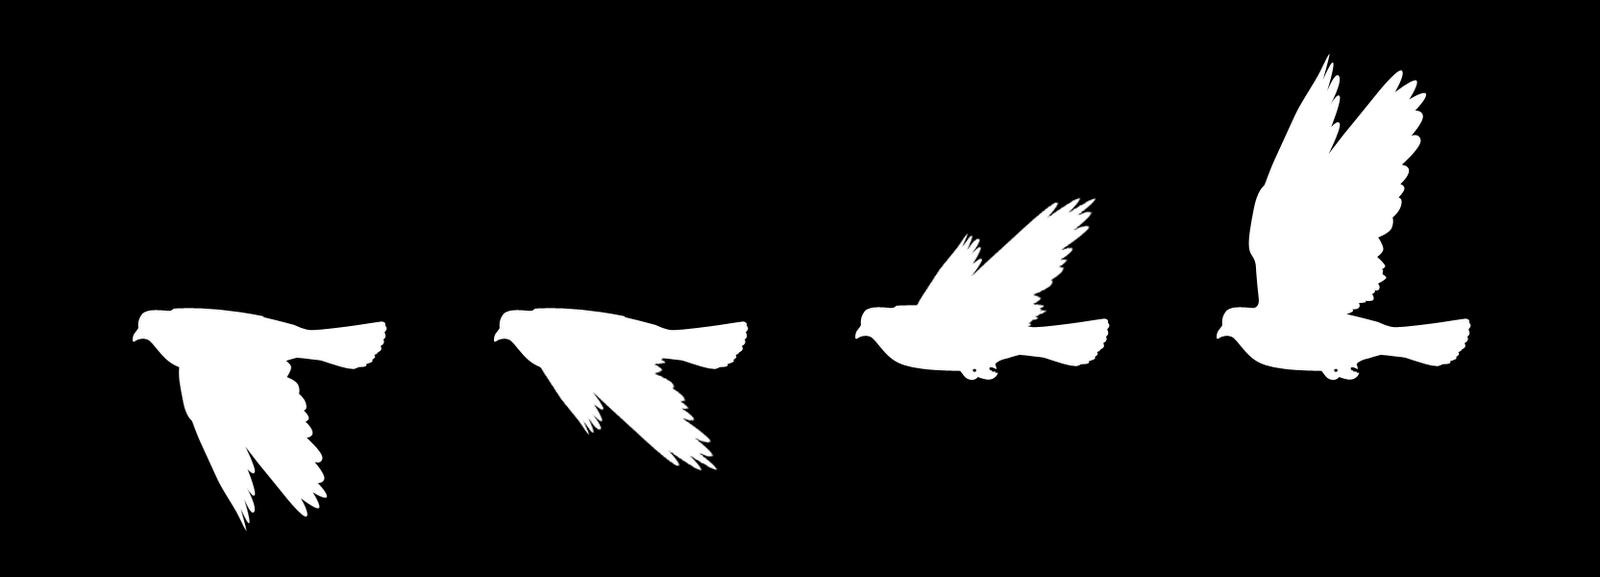 Money flies away clipart clip art royalty free SIMPLE FLYING BIRD VECTORS - Google Search | BLACKBIRD | Pinterest ... clip art royalty free